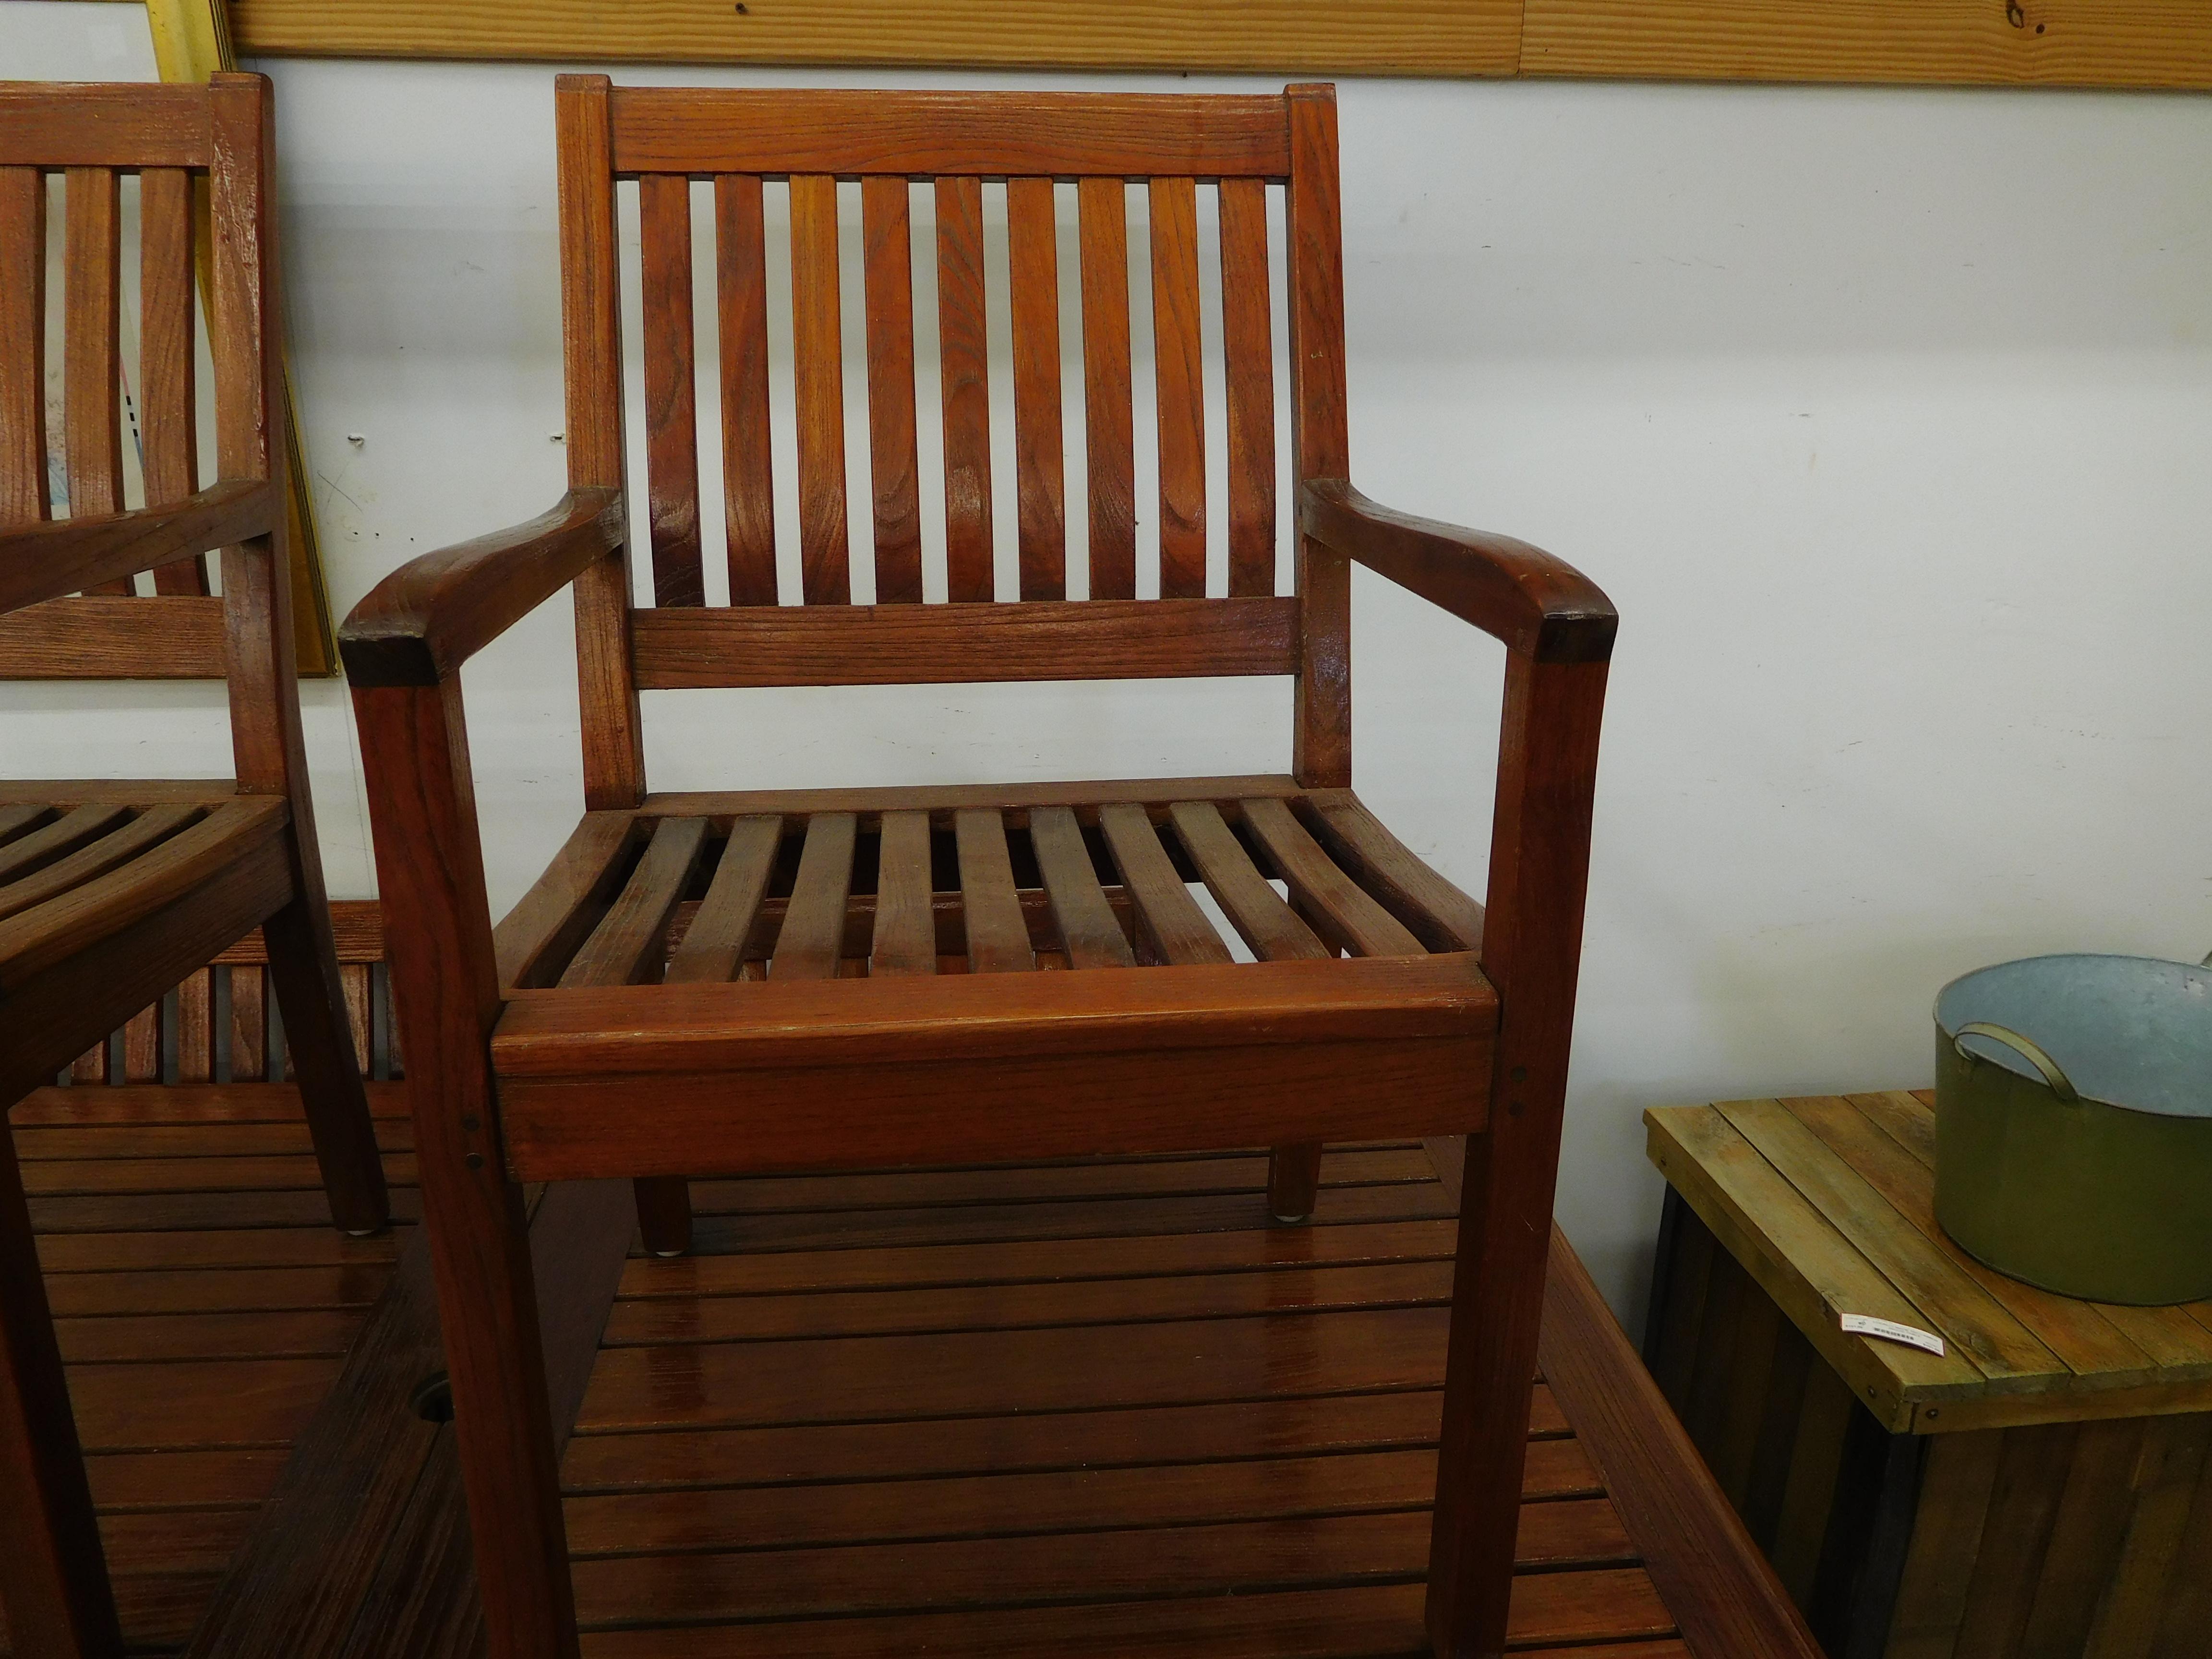 Vintage Gloucester Teak Chair from Bristol England